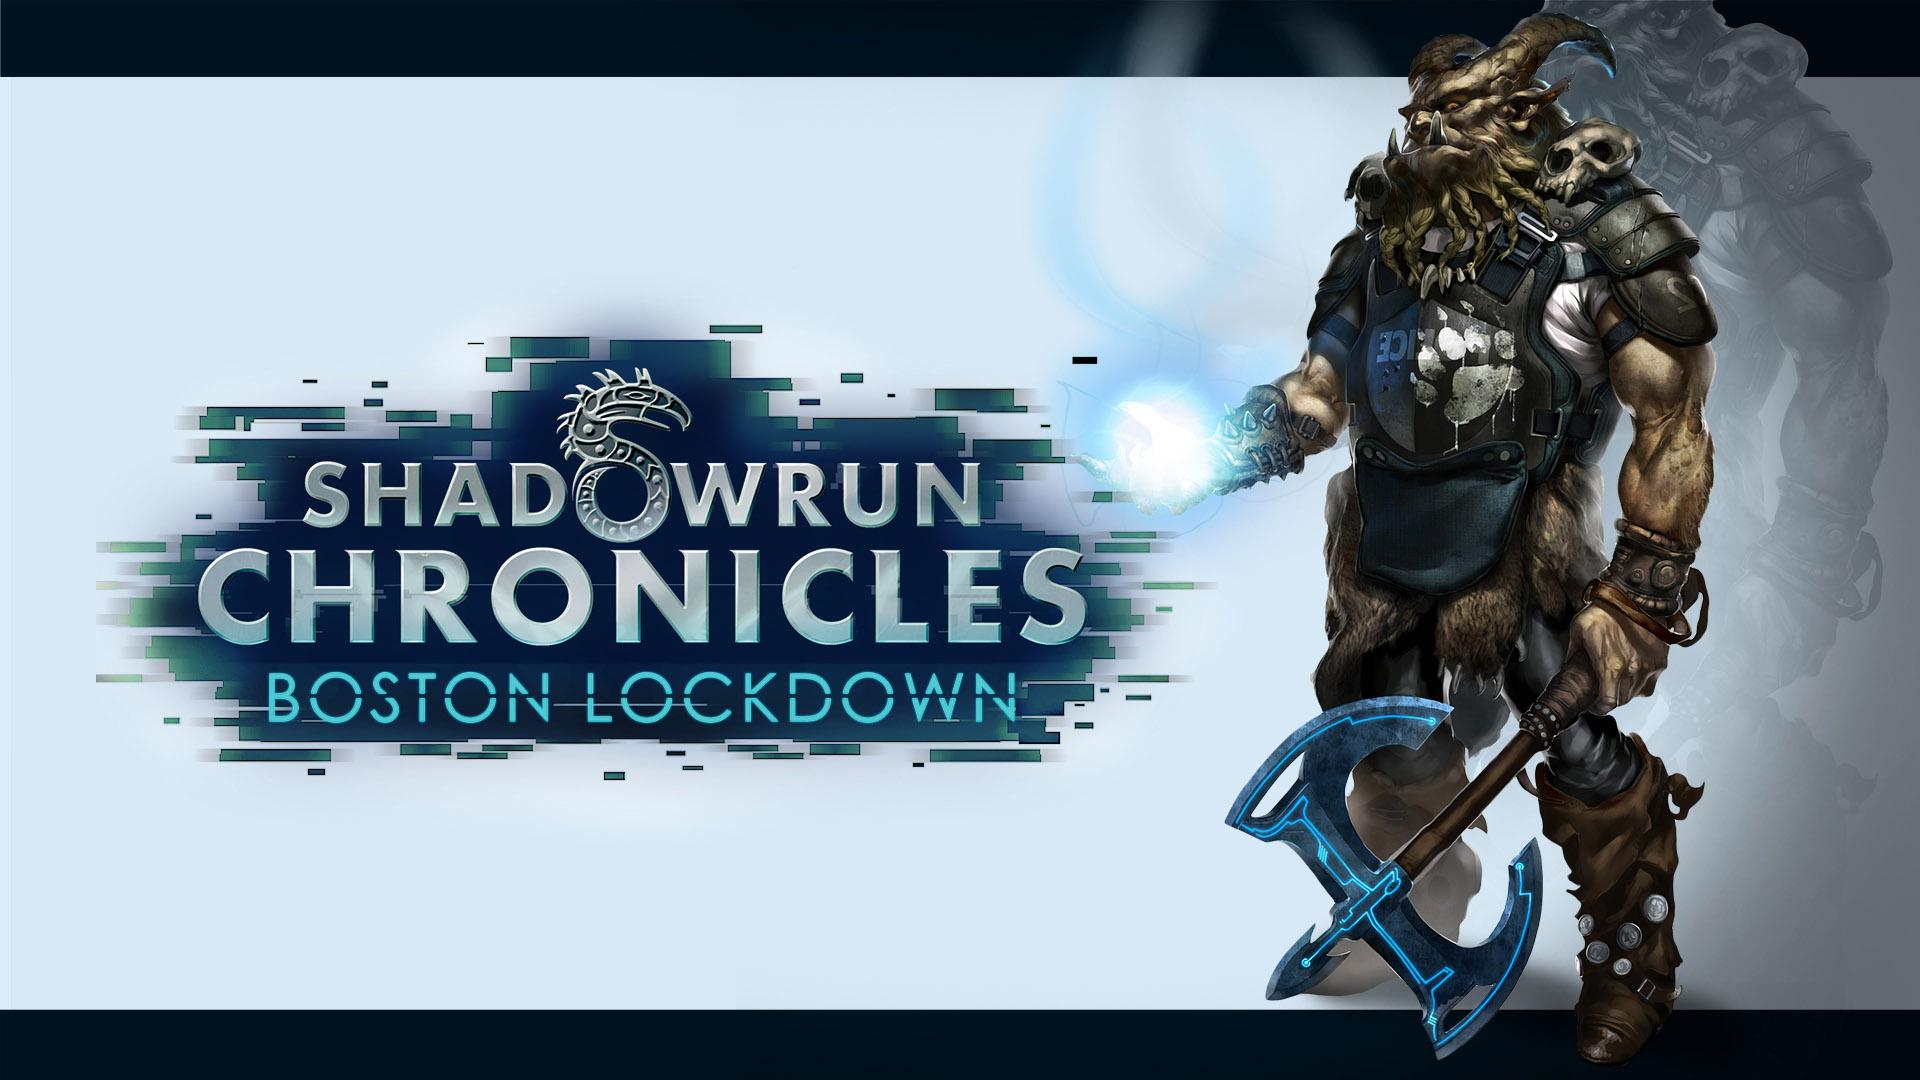 Shadowrun_Chronicles_-_Boston_Lockdown_Artwork_5 (1)